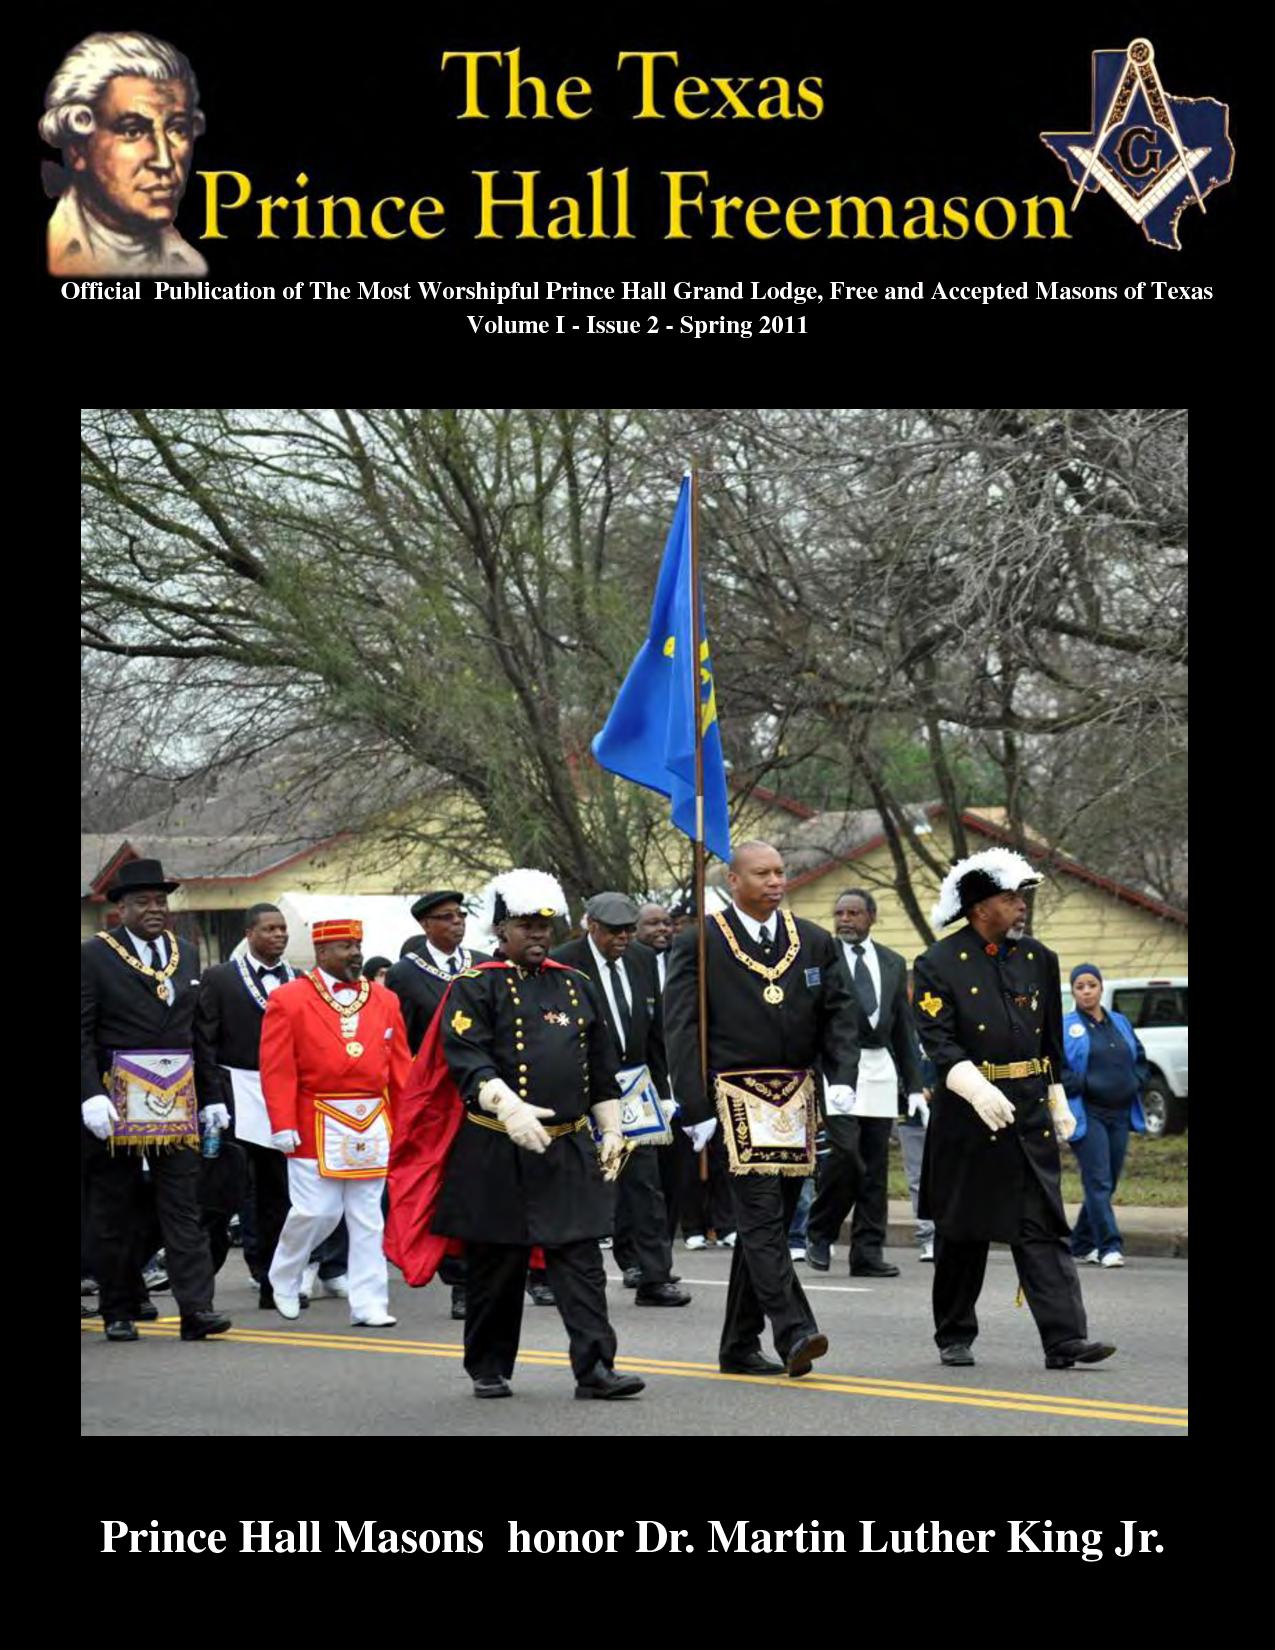 Prince Hall Masonic Wallpaper Quotes QuotesGram 1275x1650